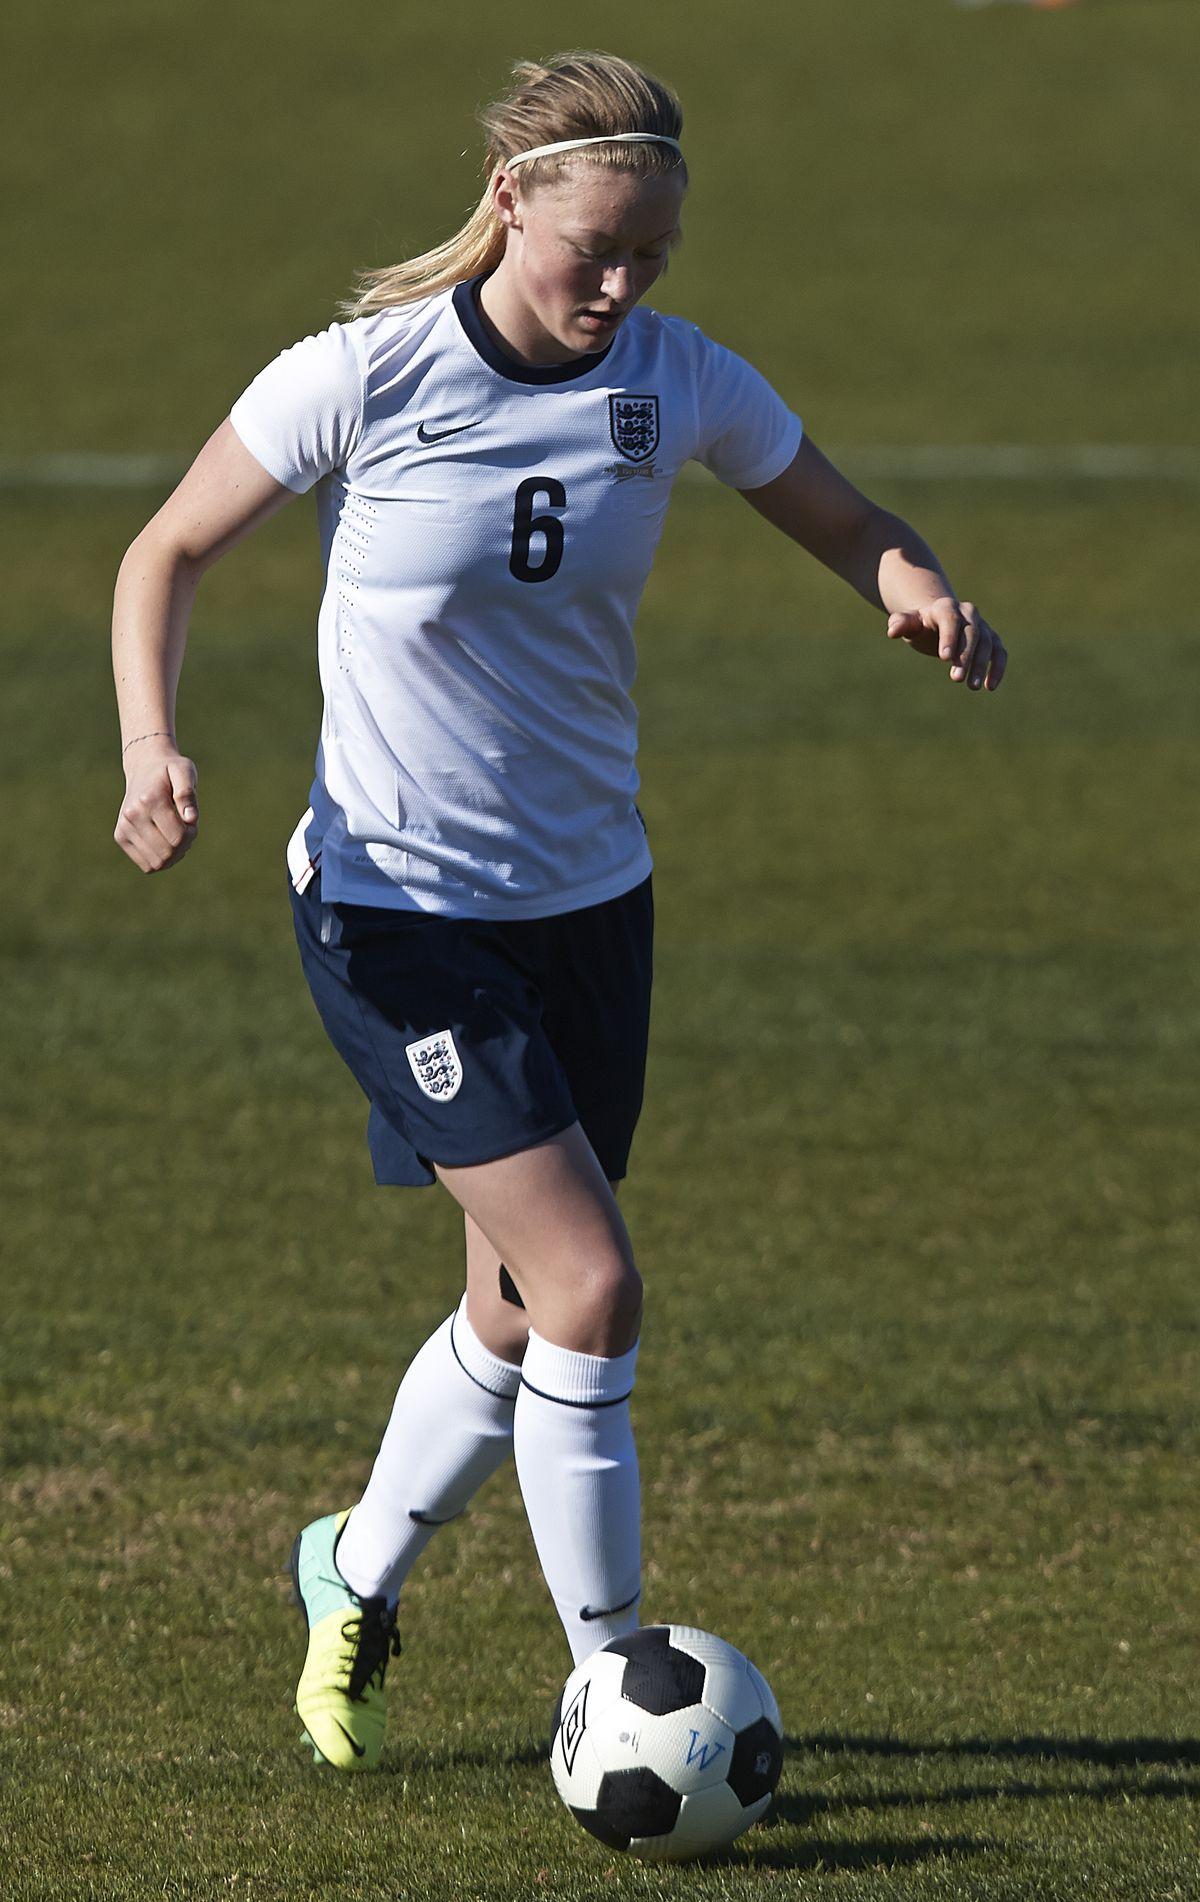 Women's U19 International: England v Republic of Ireland